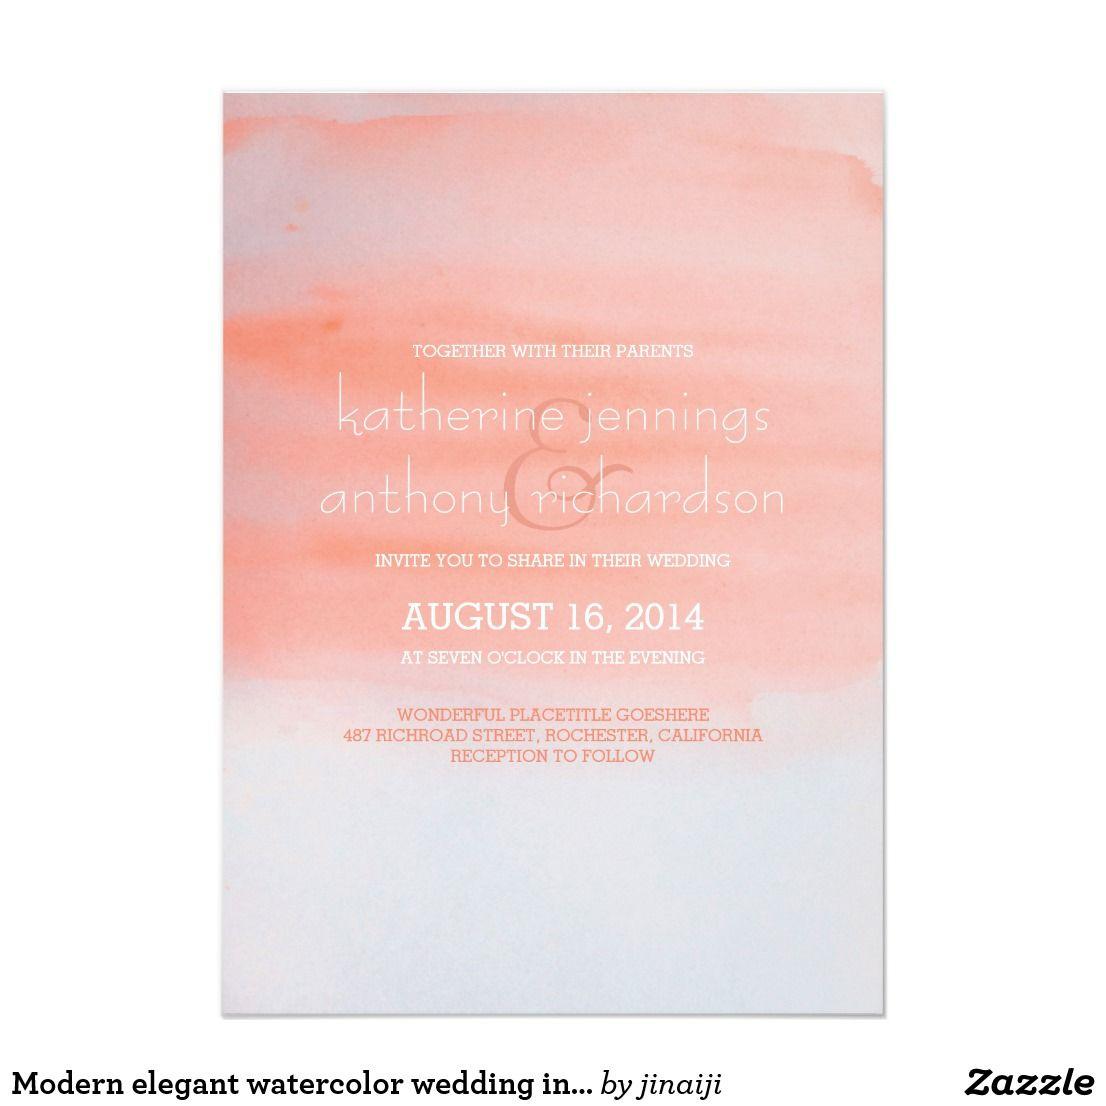 Modern elegant watercolor wedding invitation | Beach Wedding ...